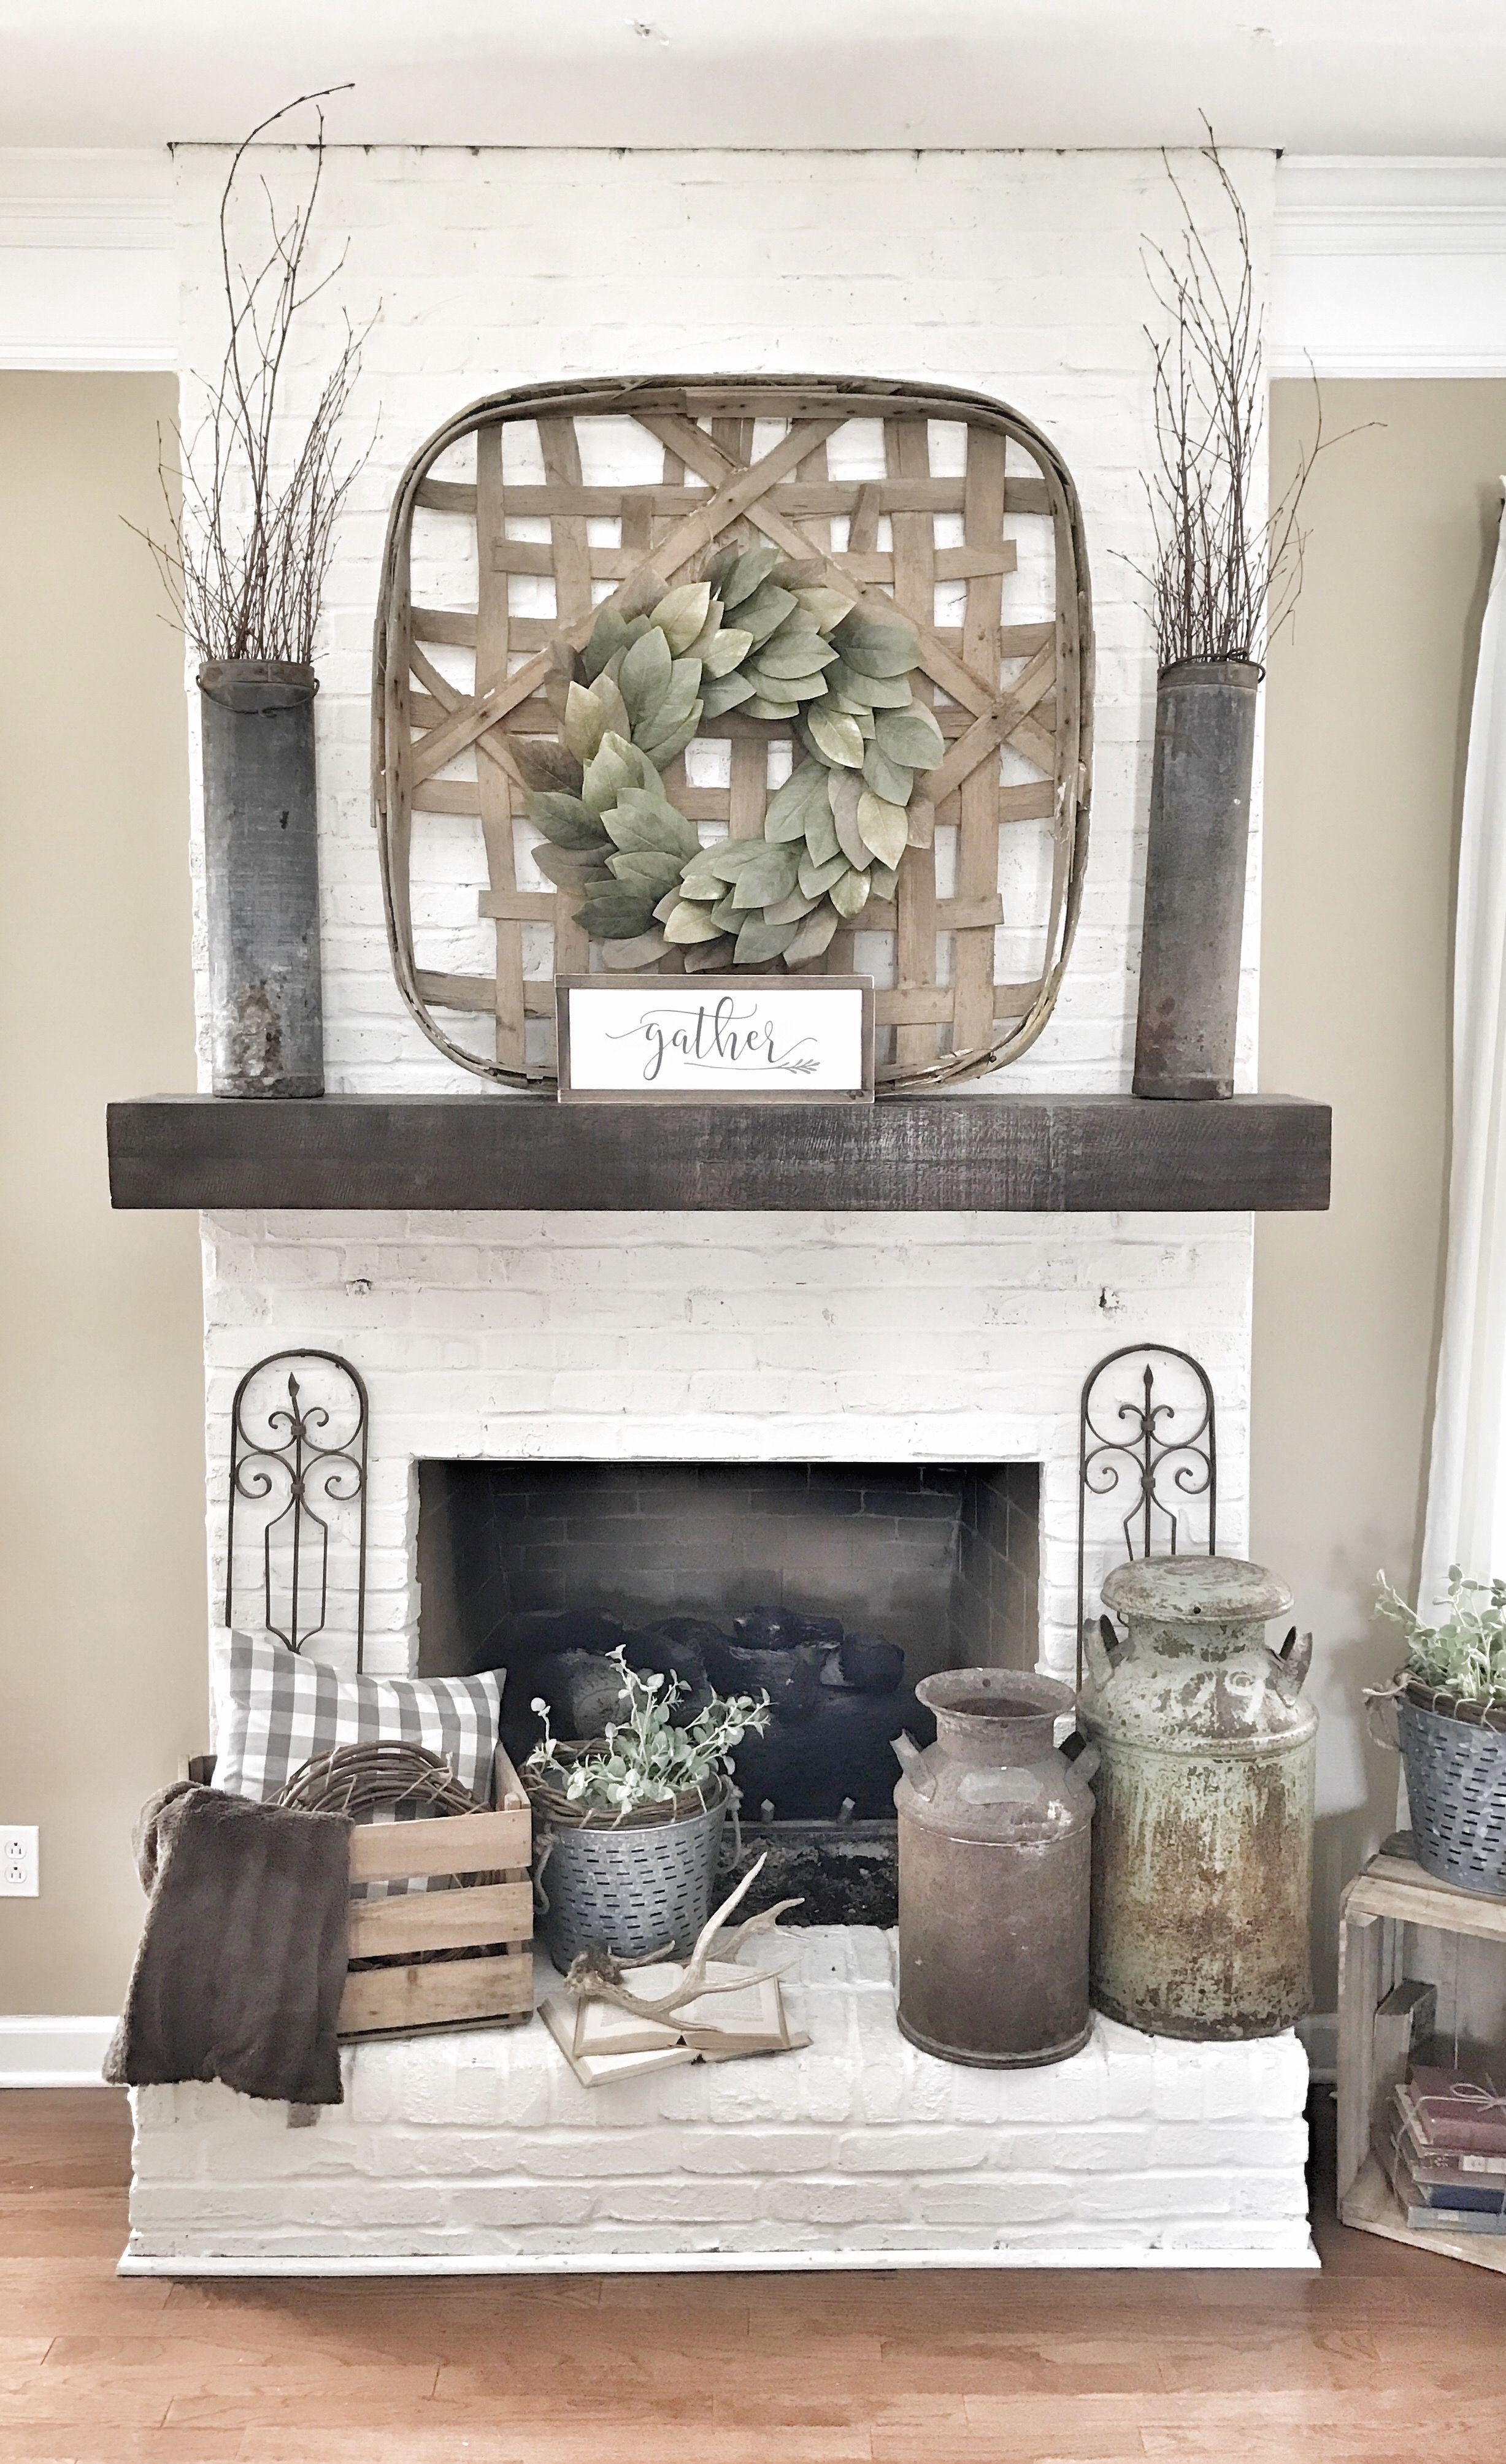 White Brick Wall Texture Interior Background Design Ideas And Remodel Decor Farmhouse Decor Living Room Home Decor